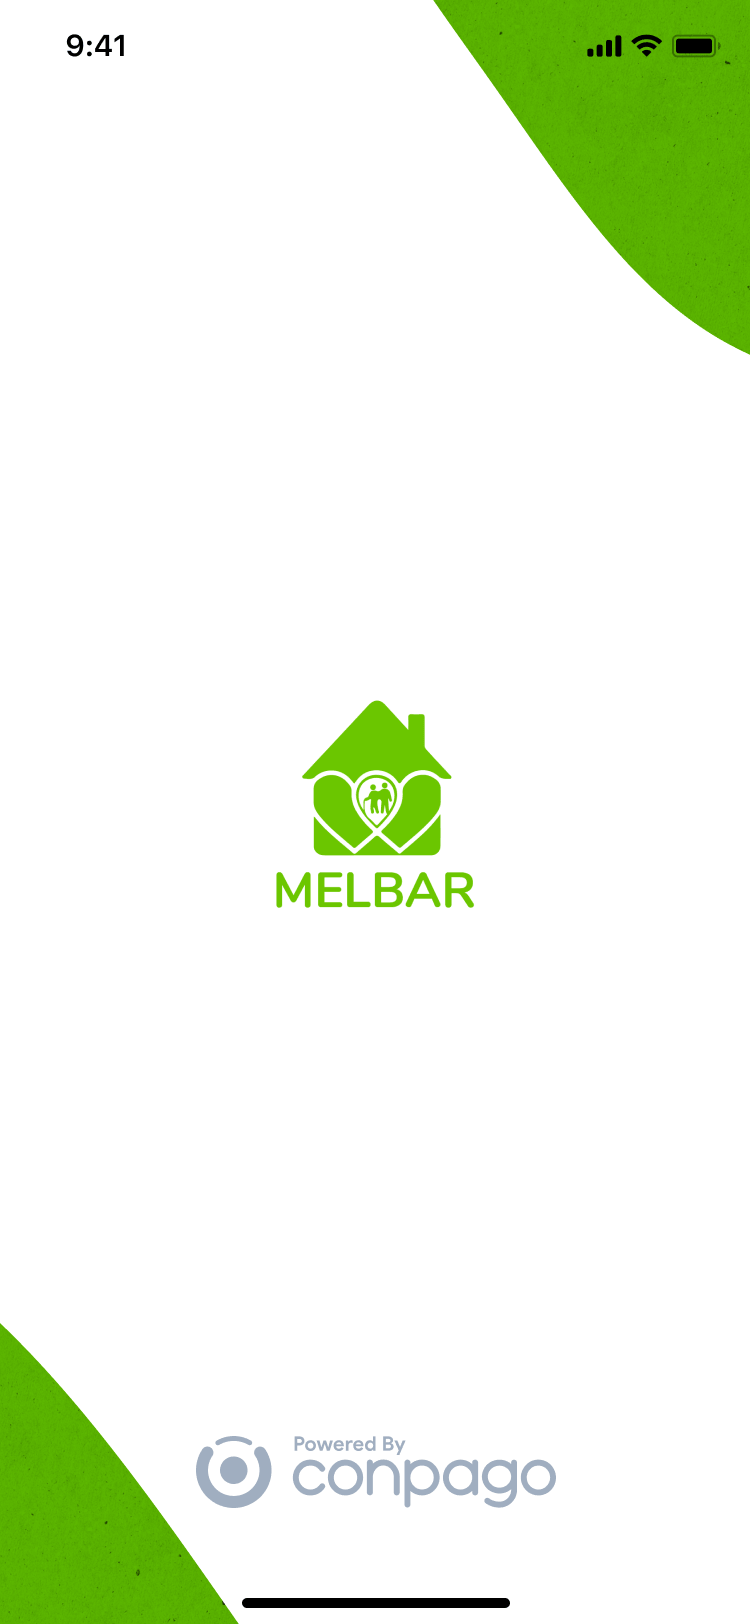 Melbar